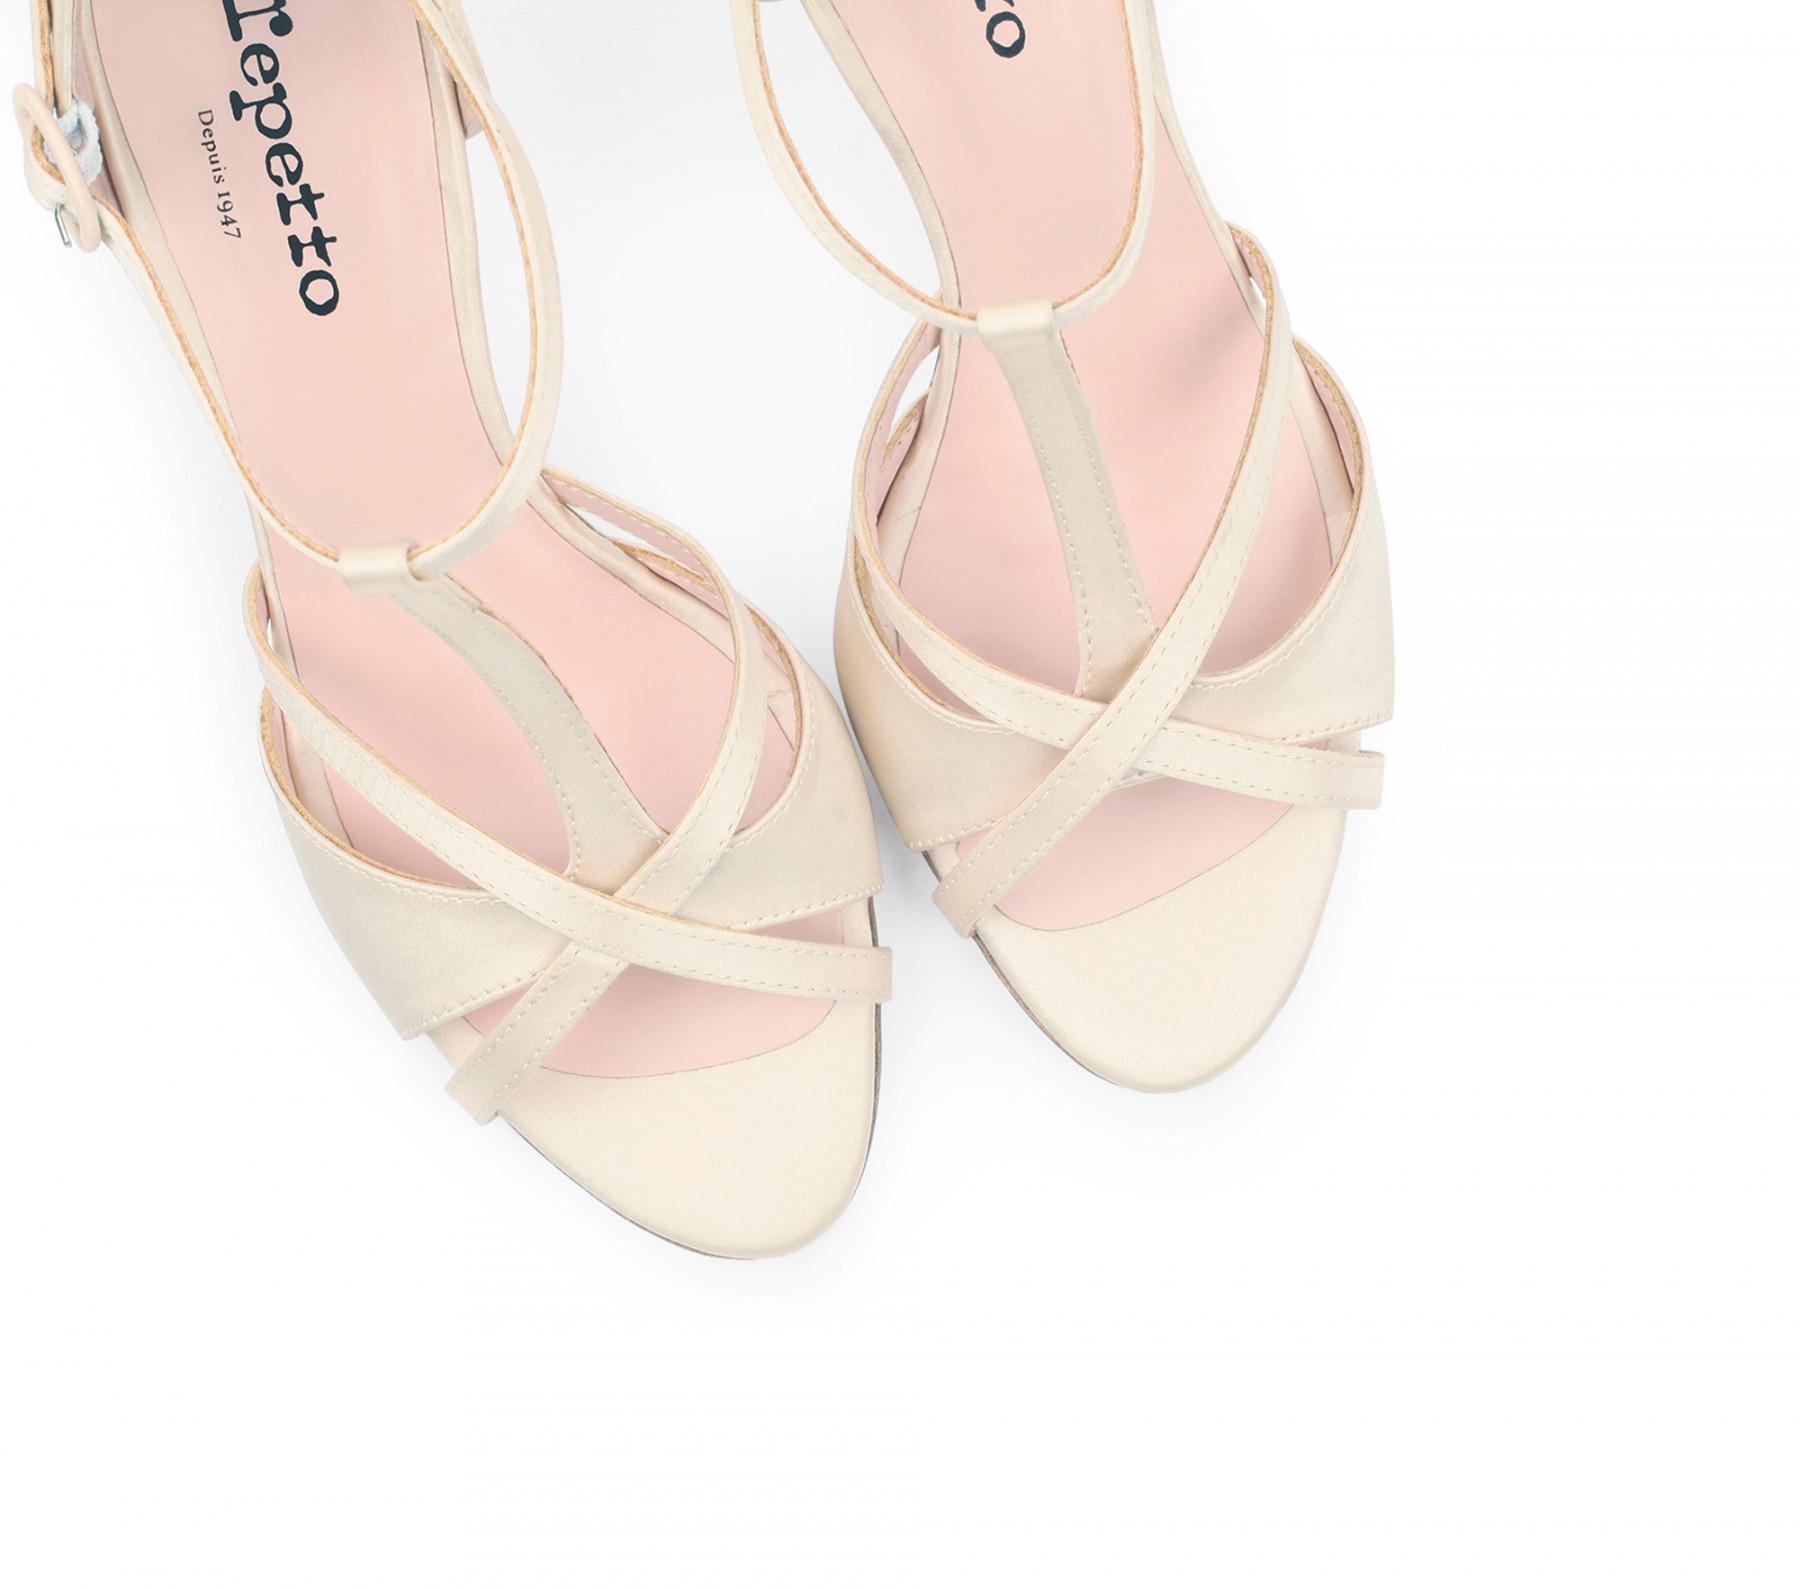 Fête sandals